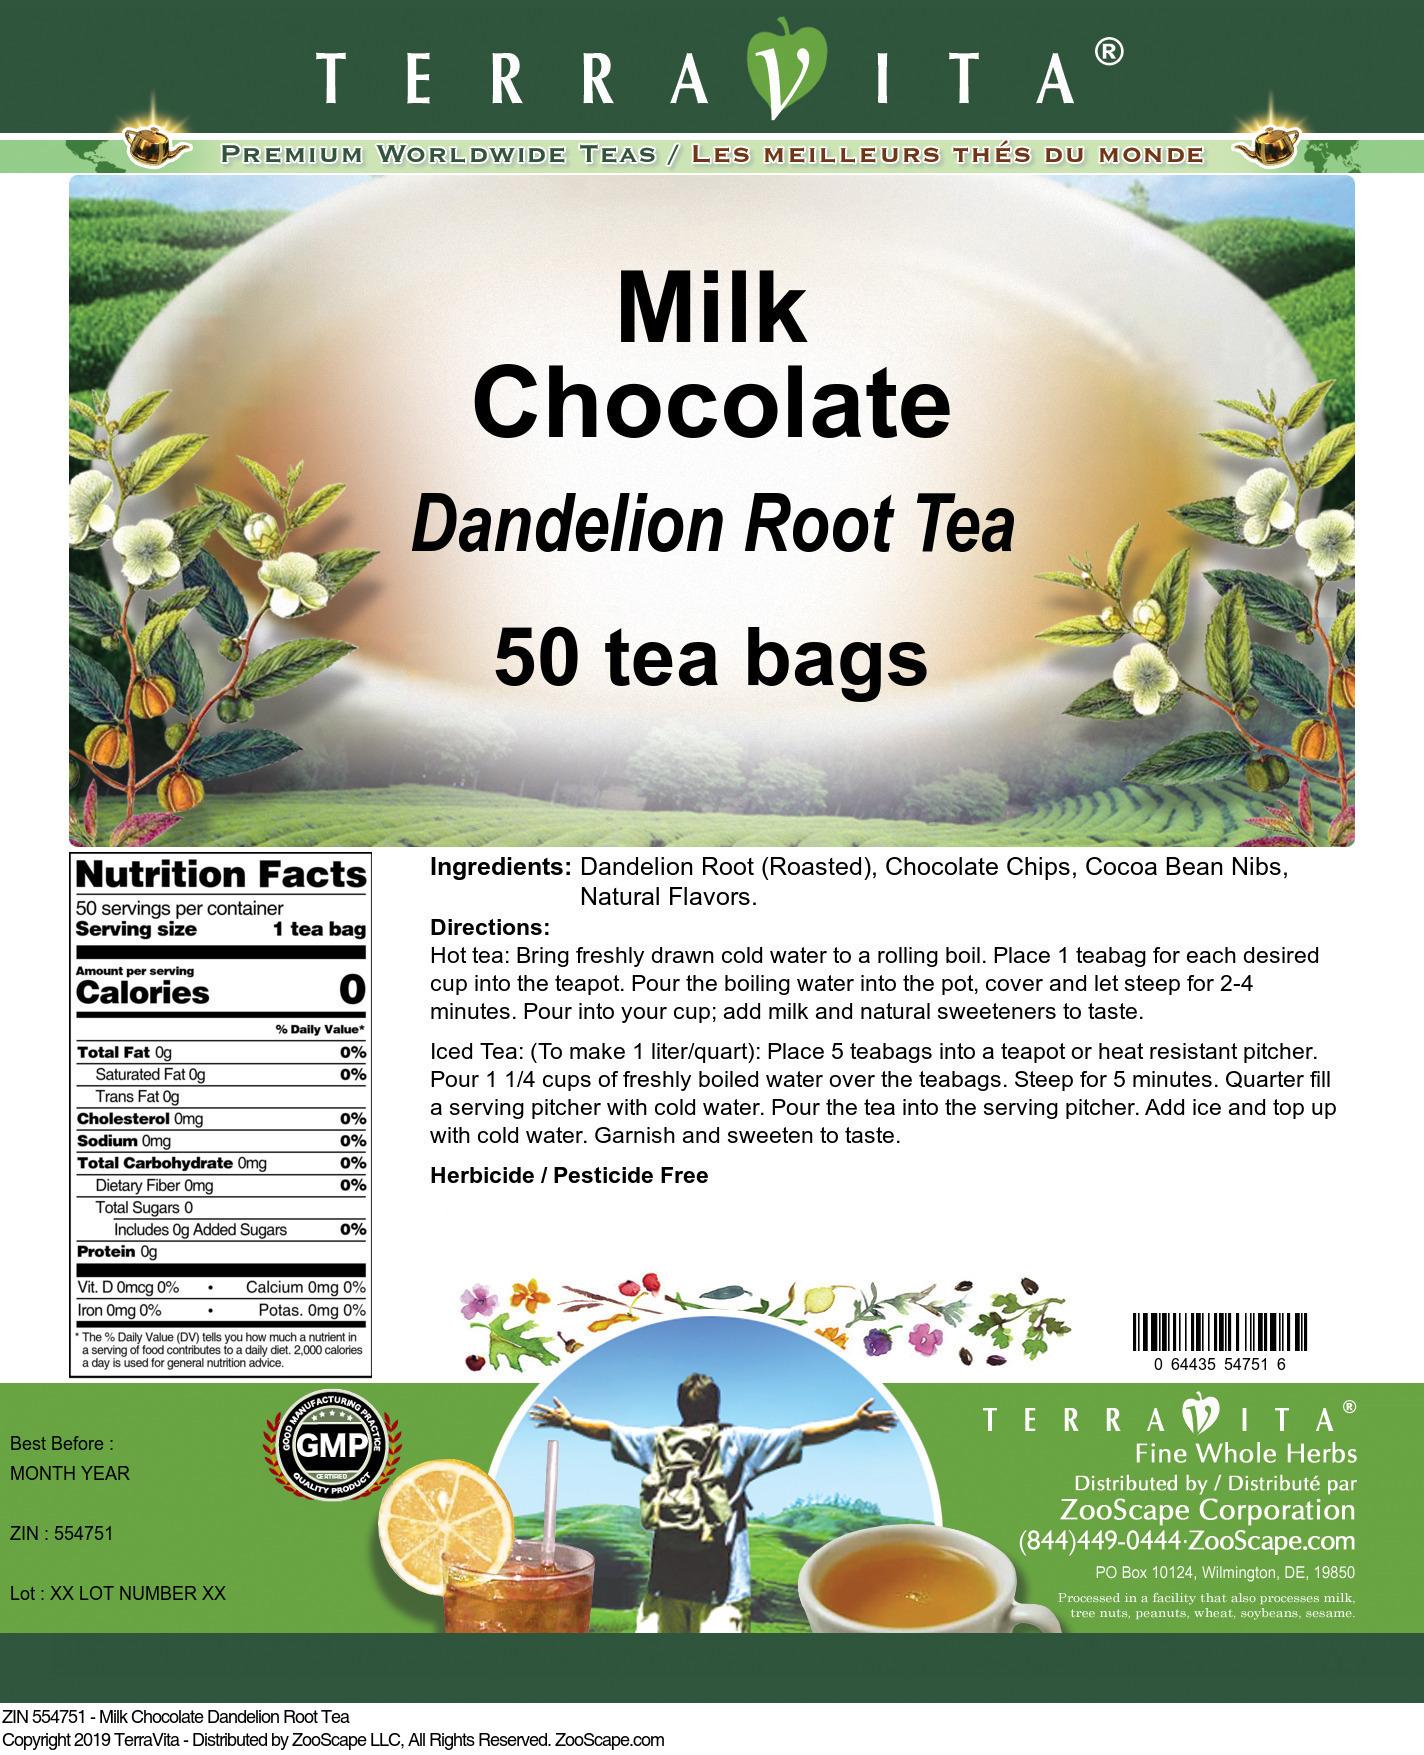 Milk Chocolate Dandelion Root